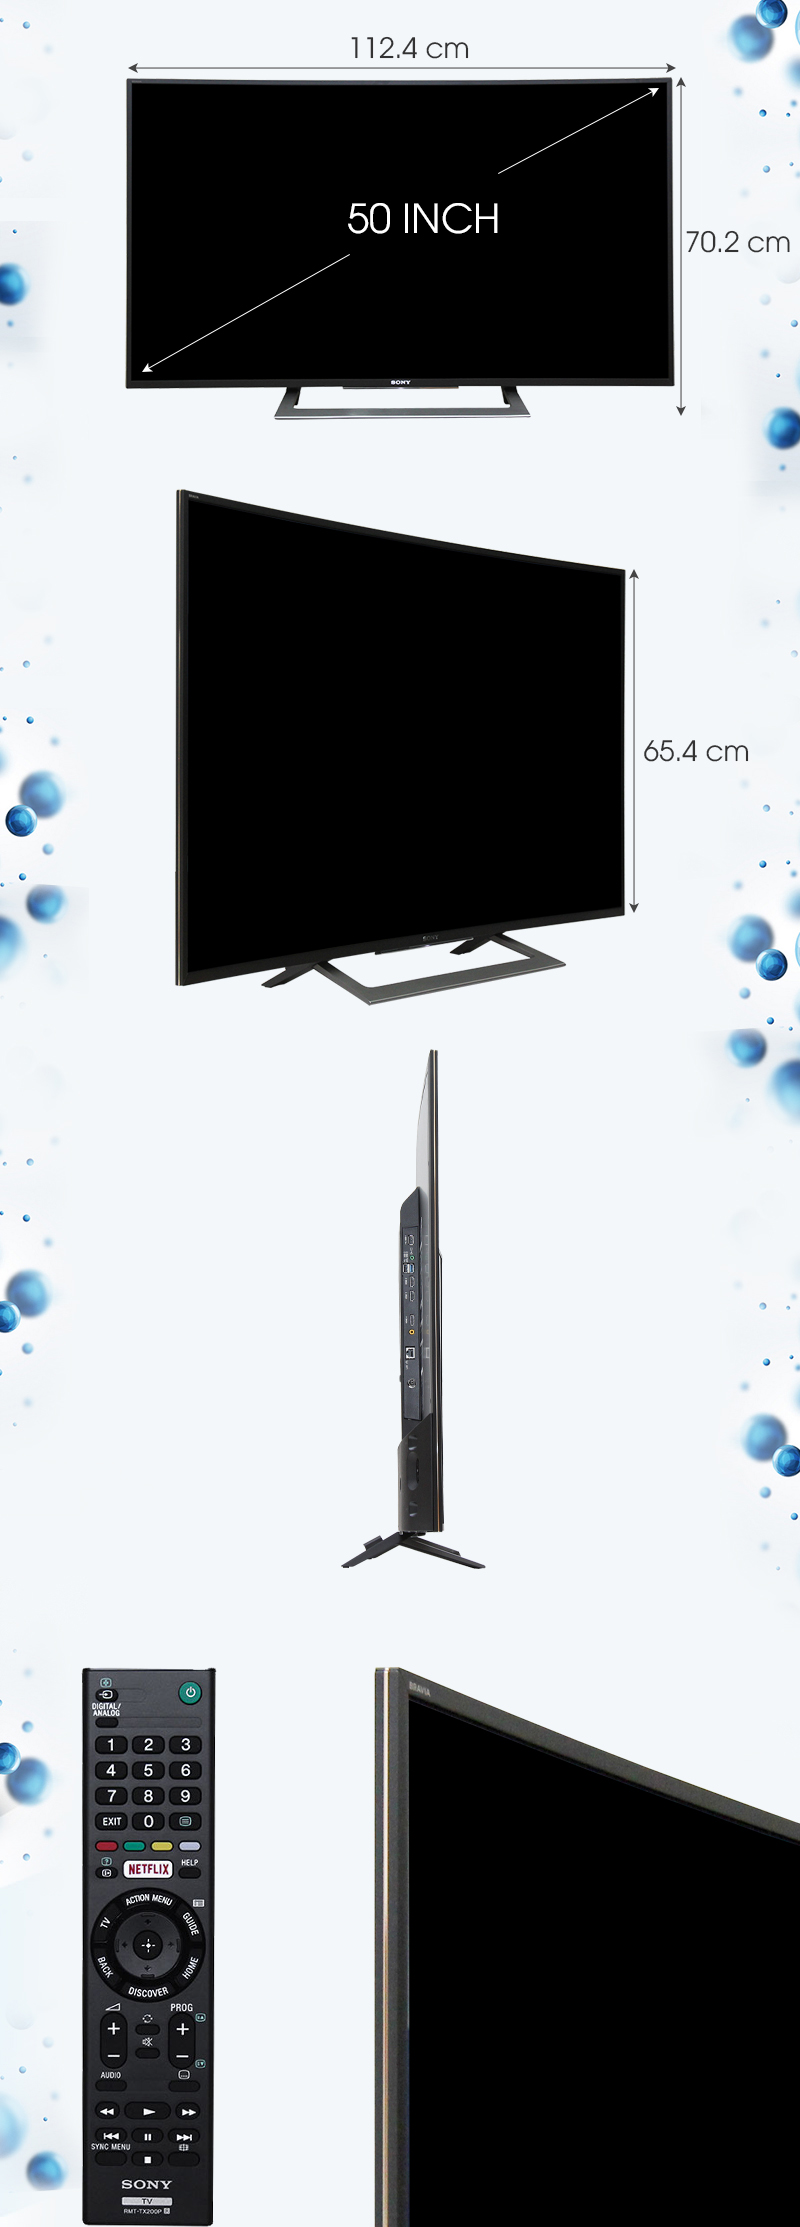 Android Tivi Sony Cong 50 inch KD-50S8000D - Kích thướcTV